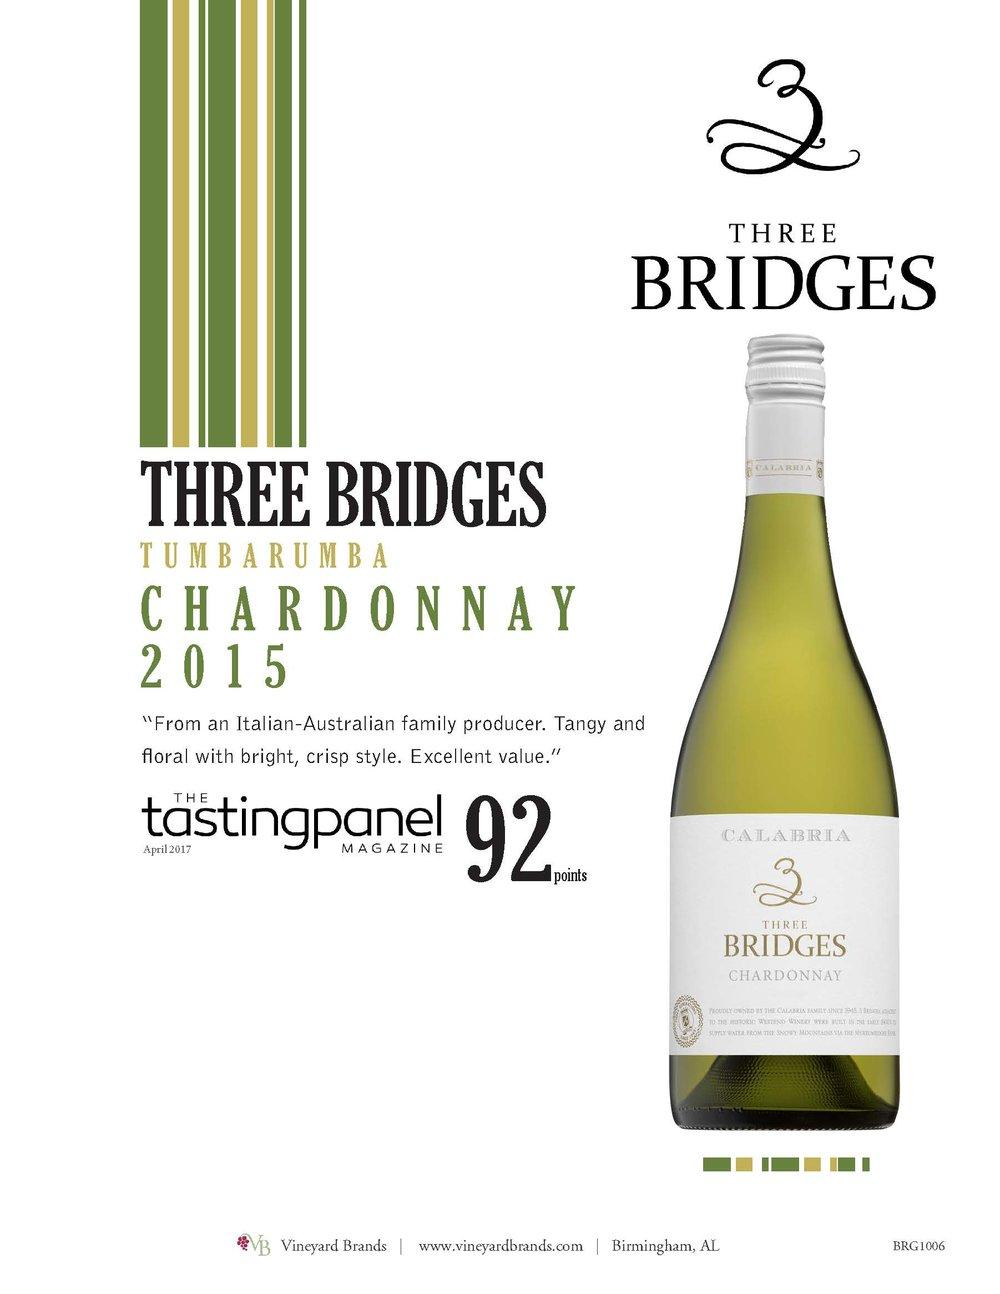 ThreeBridgesChardonnay2015.jpg